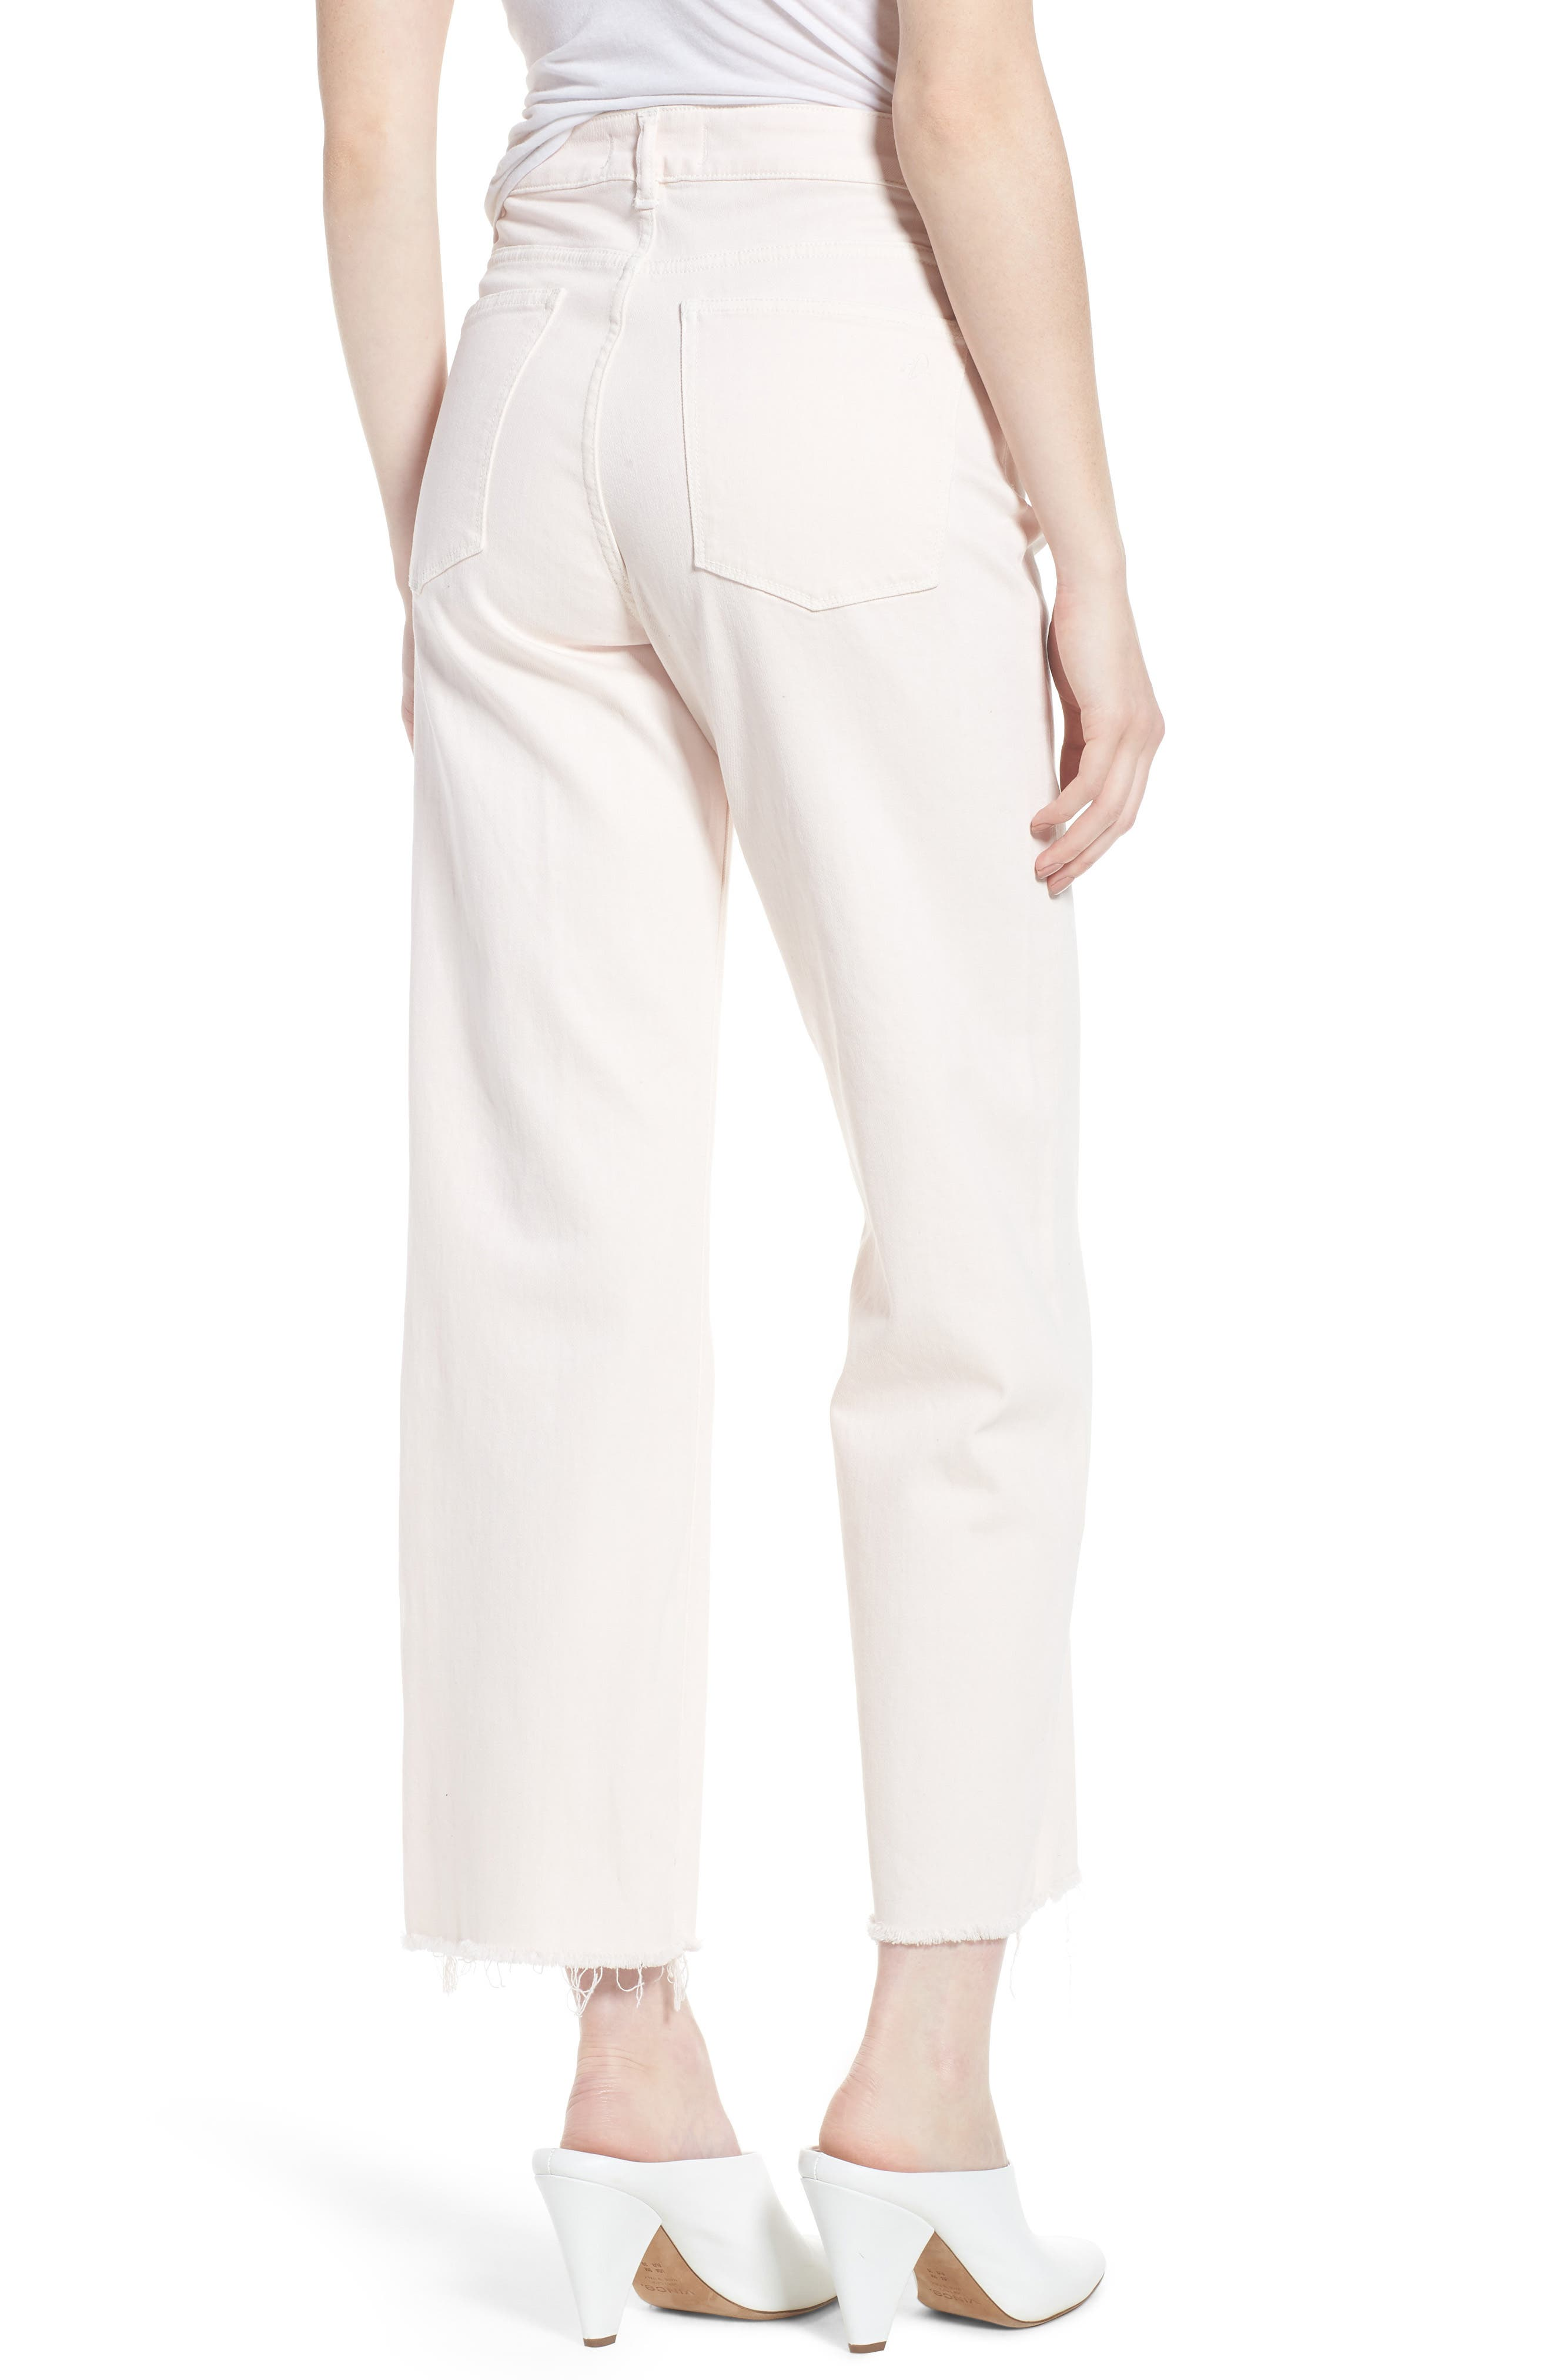 Hepburn Ankle Wide Leg Jeans,                             Alternate thumbnail 2, color,                             Blush Pink